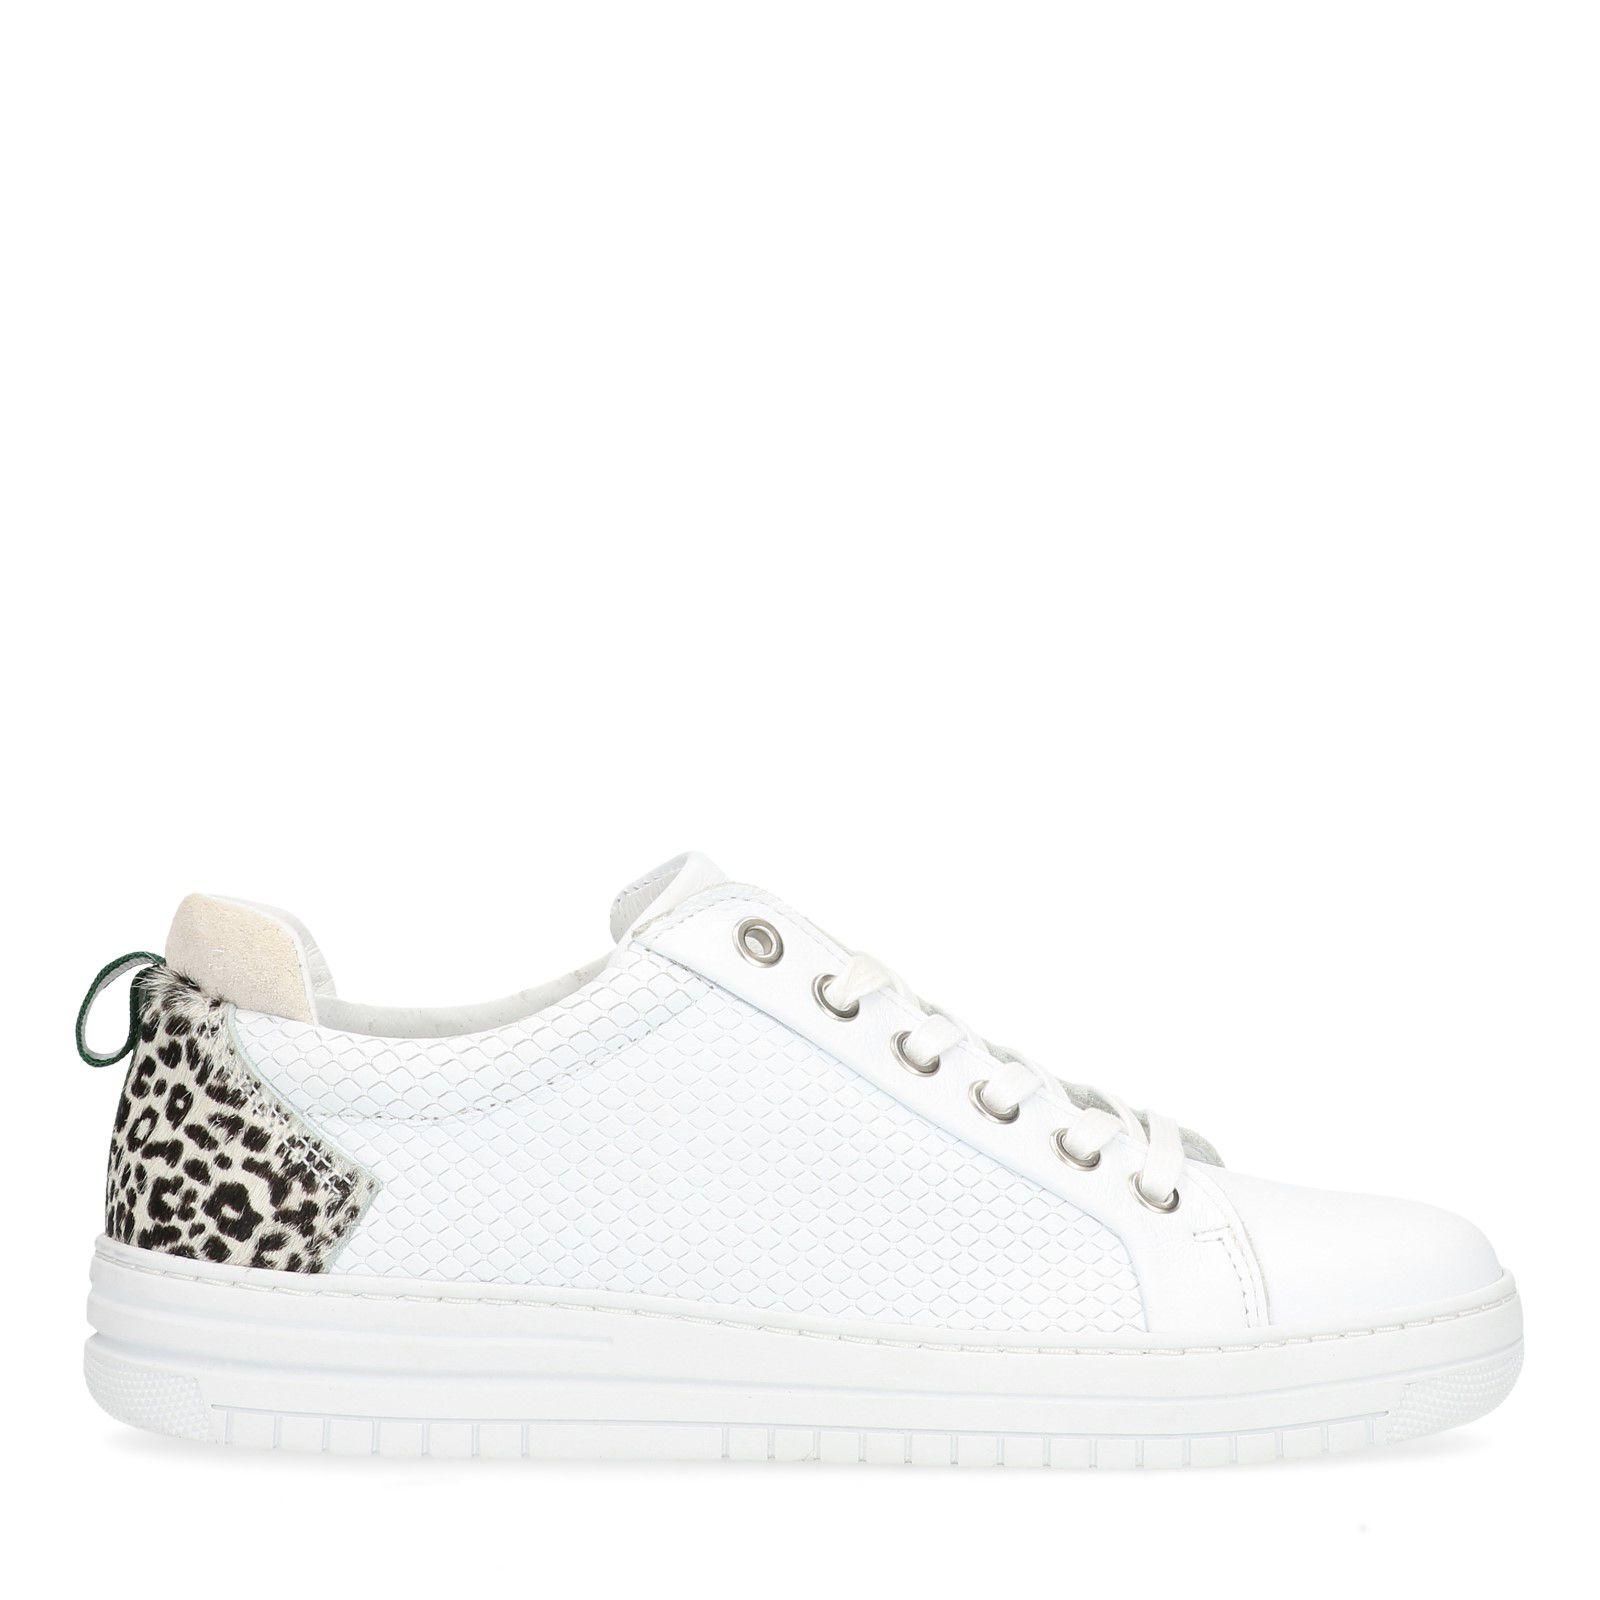 7577e12a16e Witte sneakers met panterprint details - Dames   MANFIELD